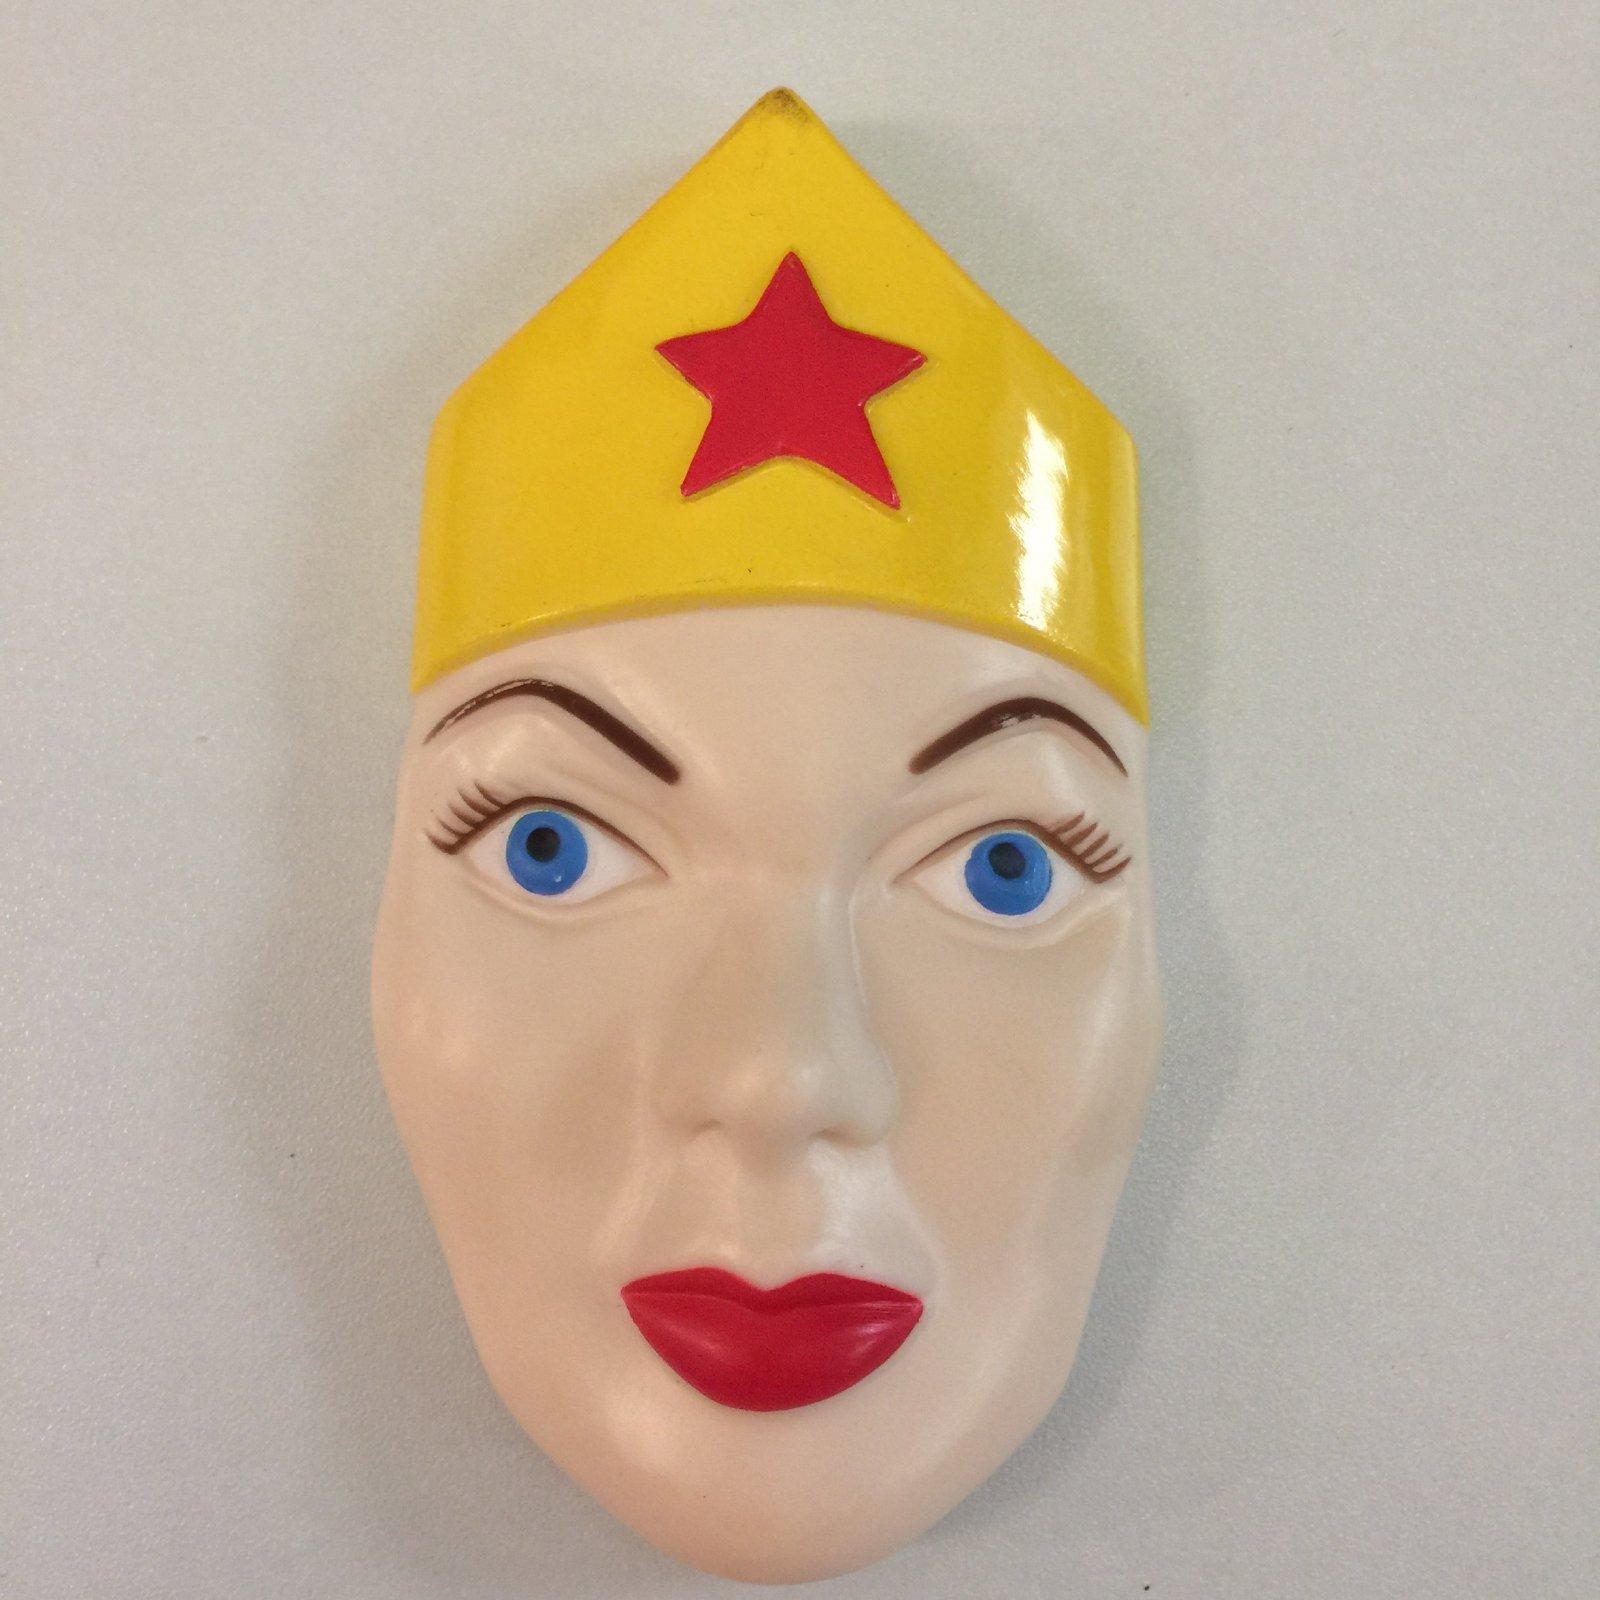 Wonder Woman Face Plate Cake Topper